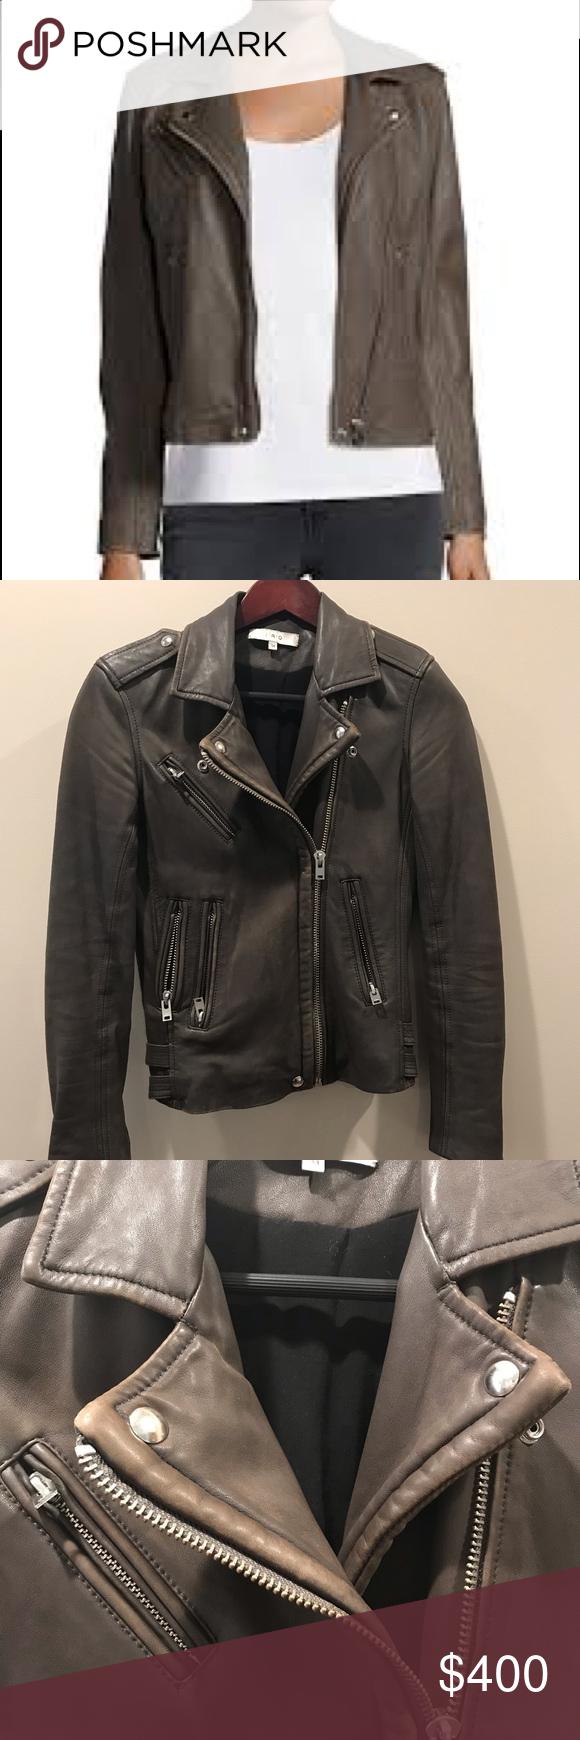 Iro Han Leather Moto Jacket Size 34 Leather Moto Jacket Clothes Design Fashion [ 1740 x 580 Pixel ]